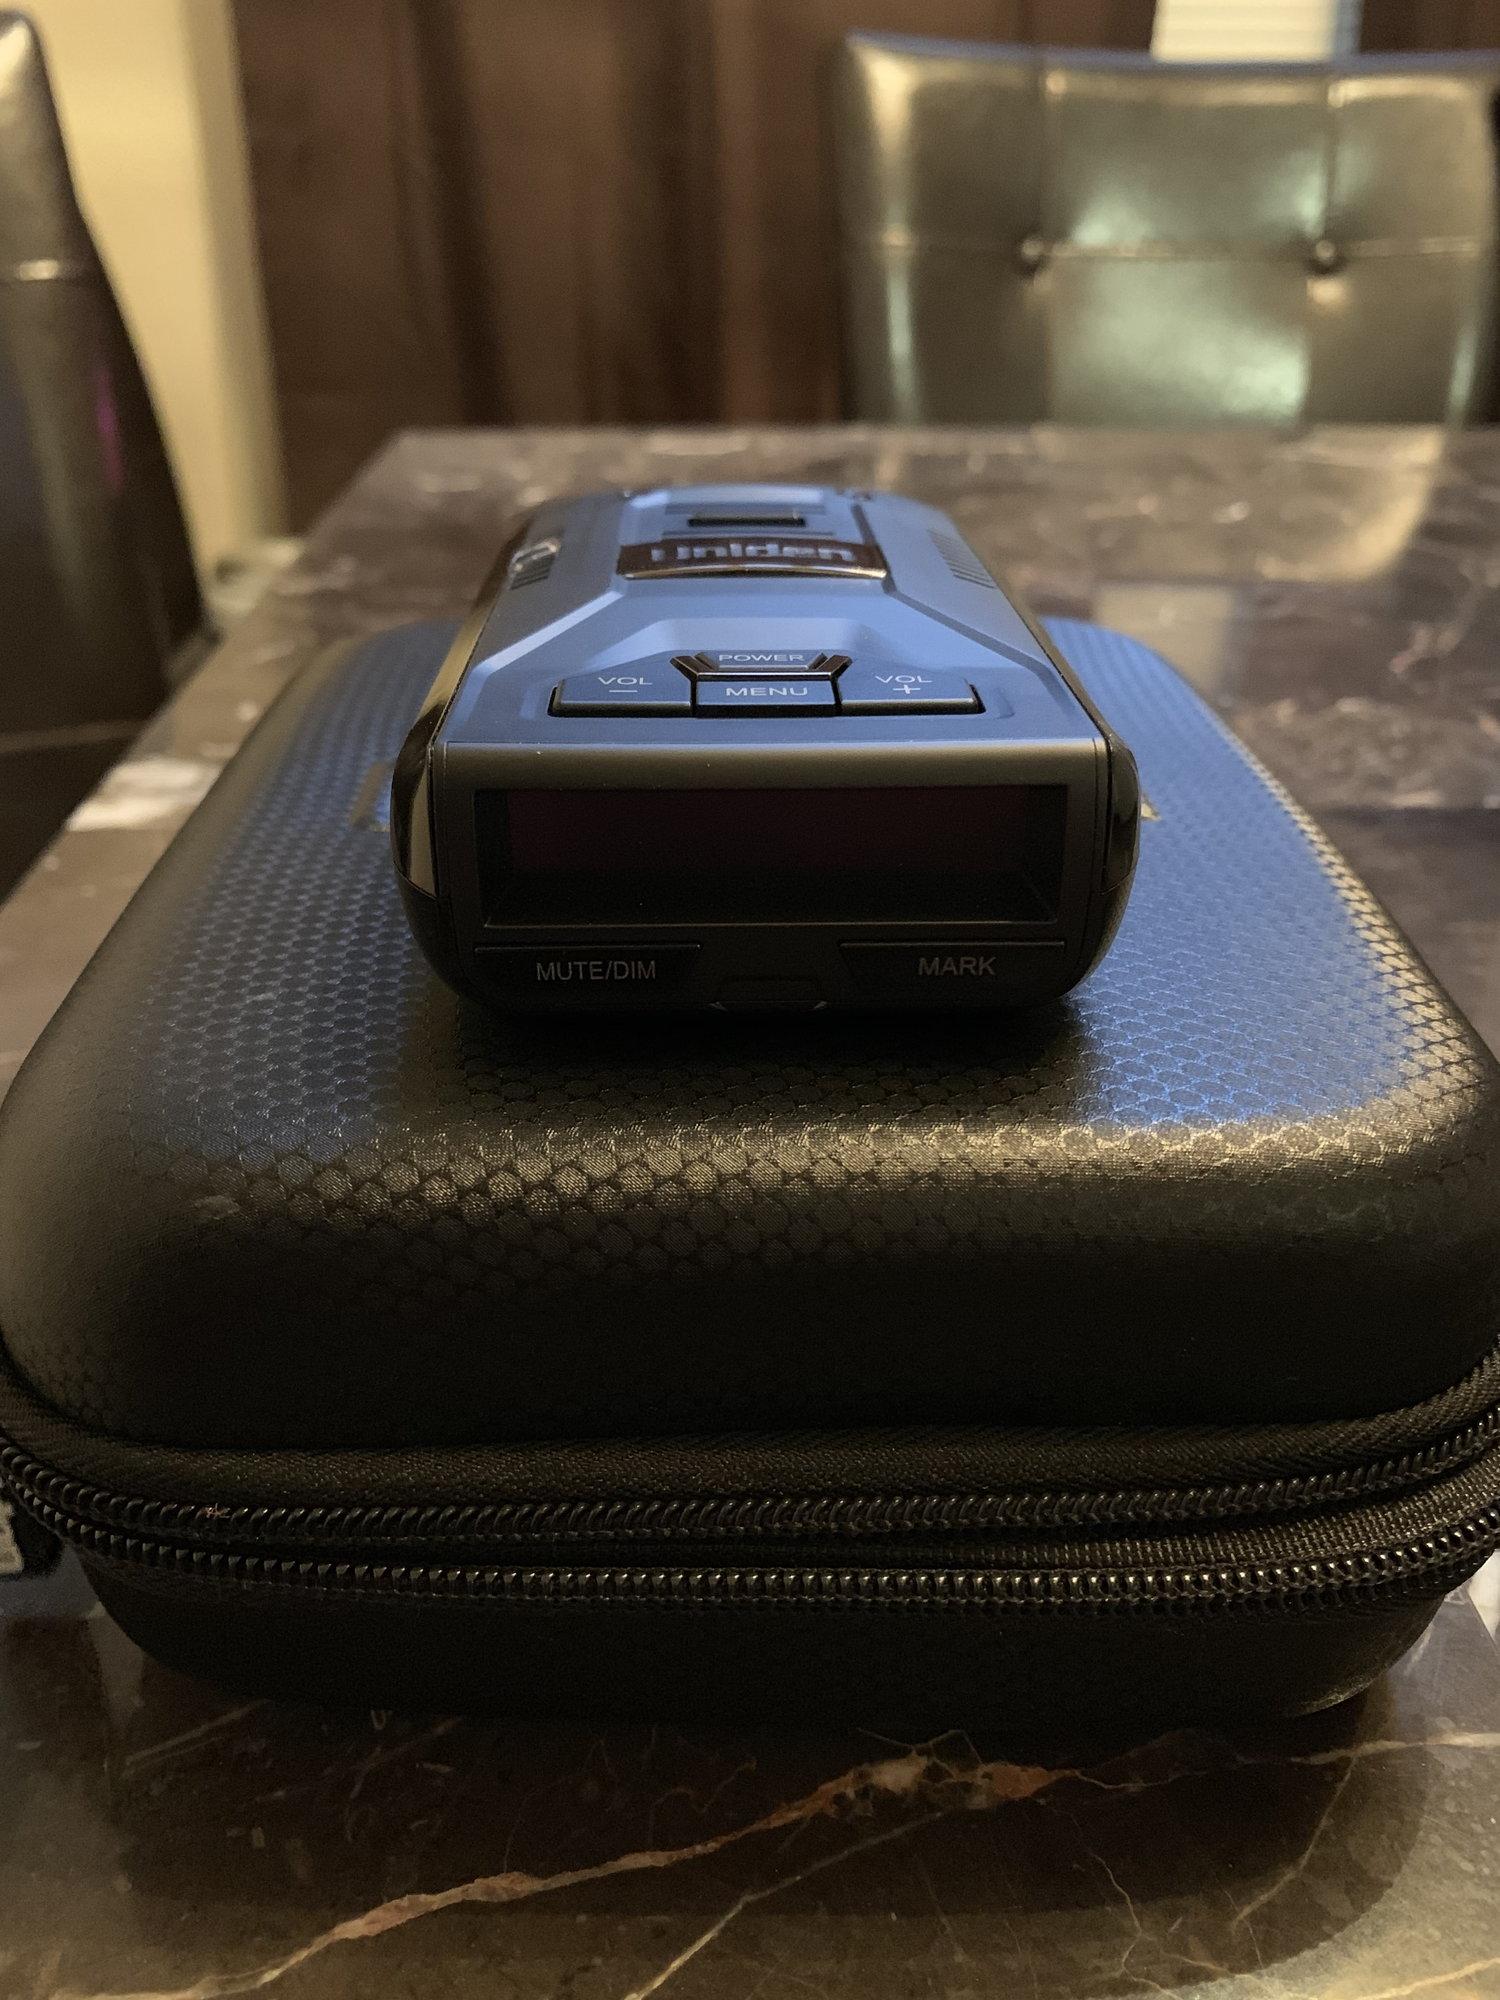 FS (For Sale) Uniden R3 Radar Detector - CorvetteForum - Chevrolet